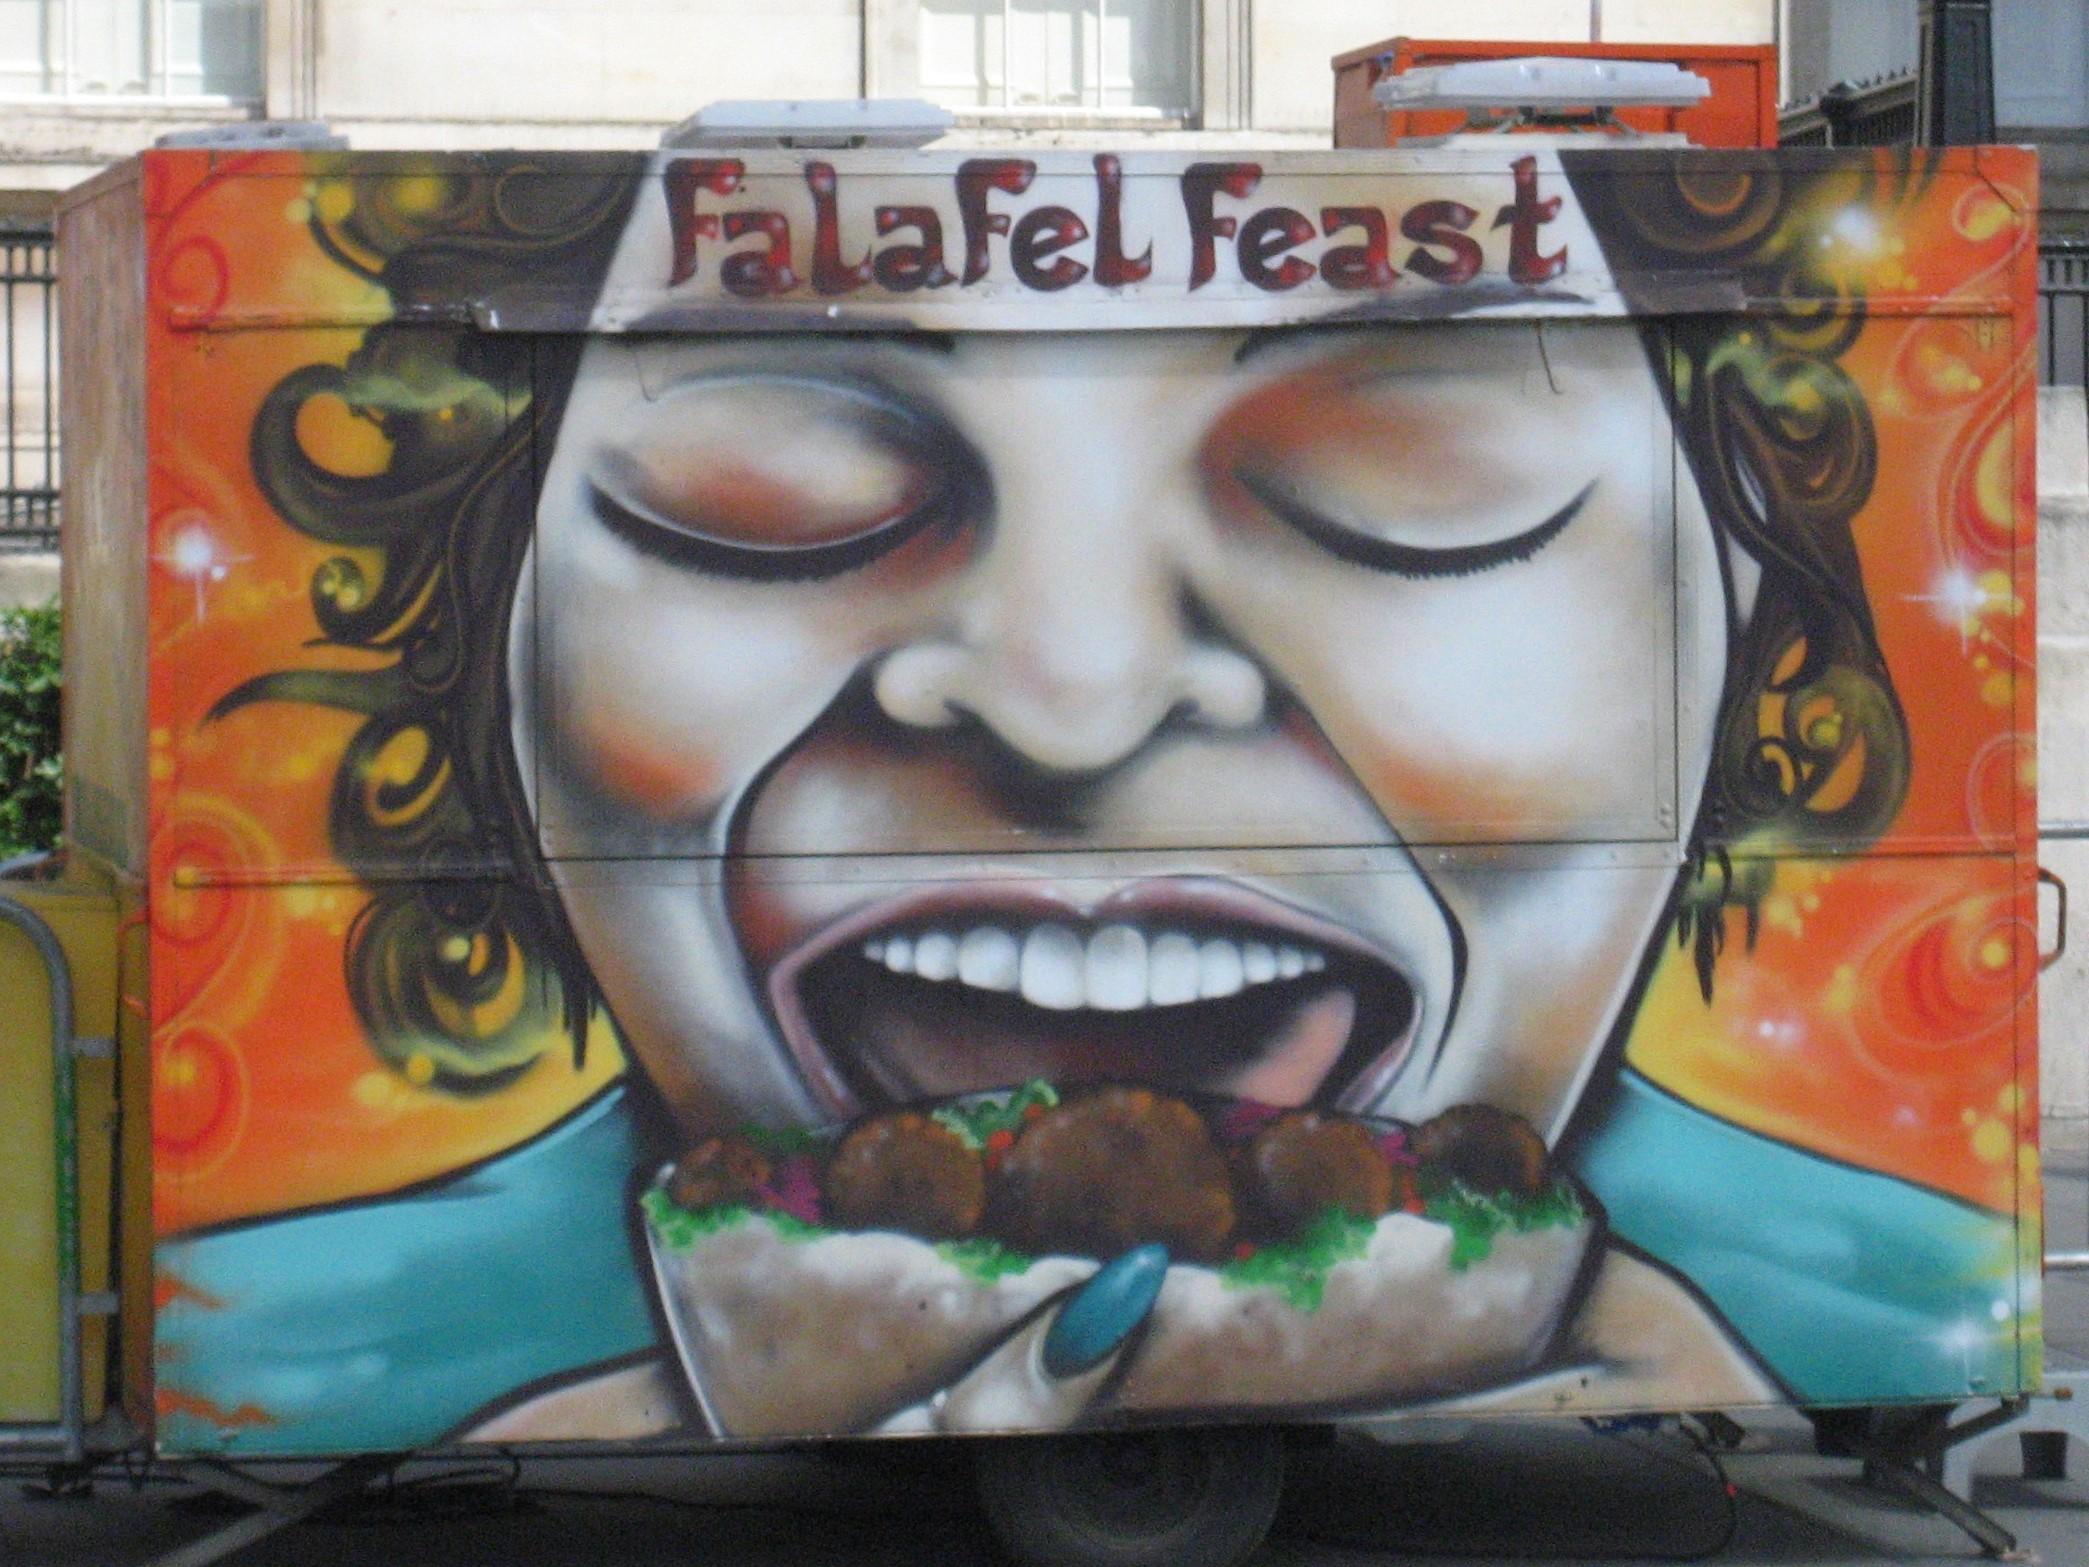 Food falafel - Street Art UK - London - by Steve Nimmons